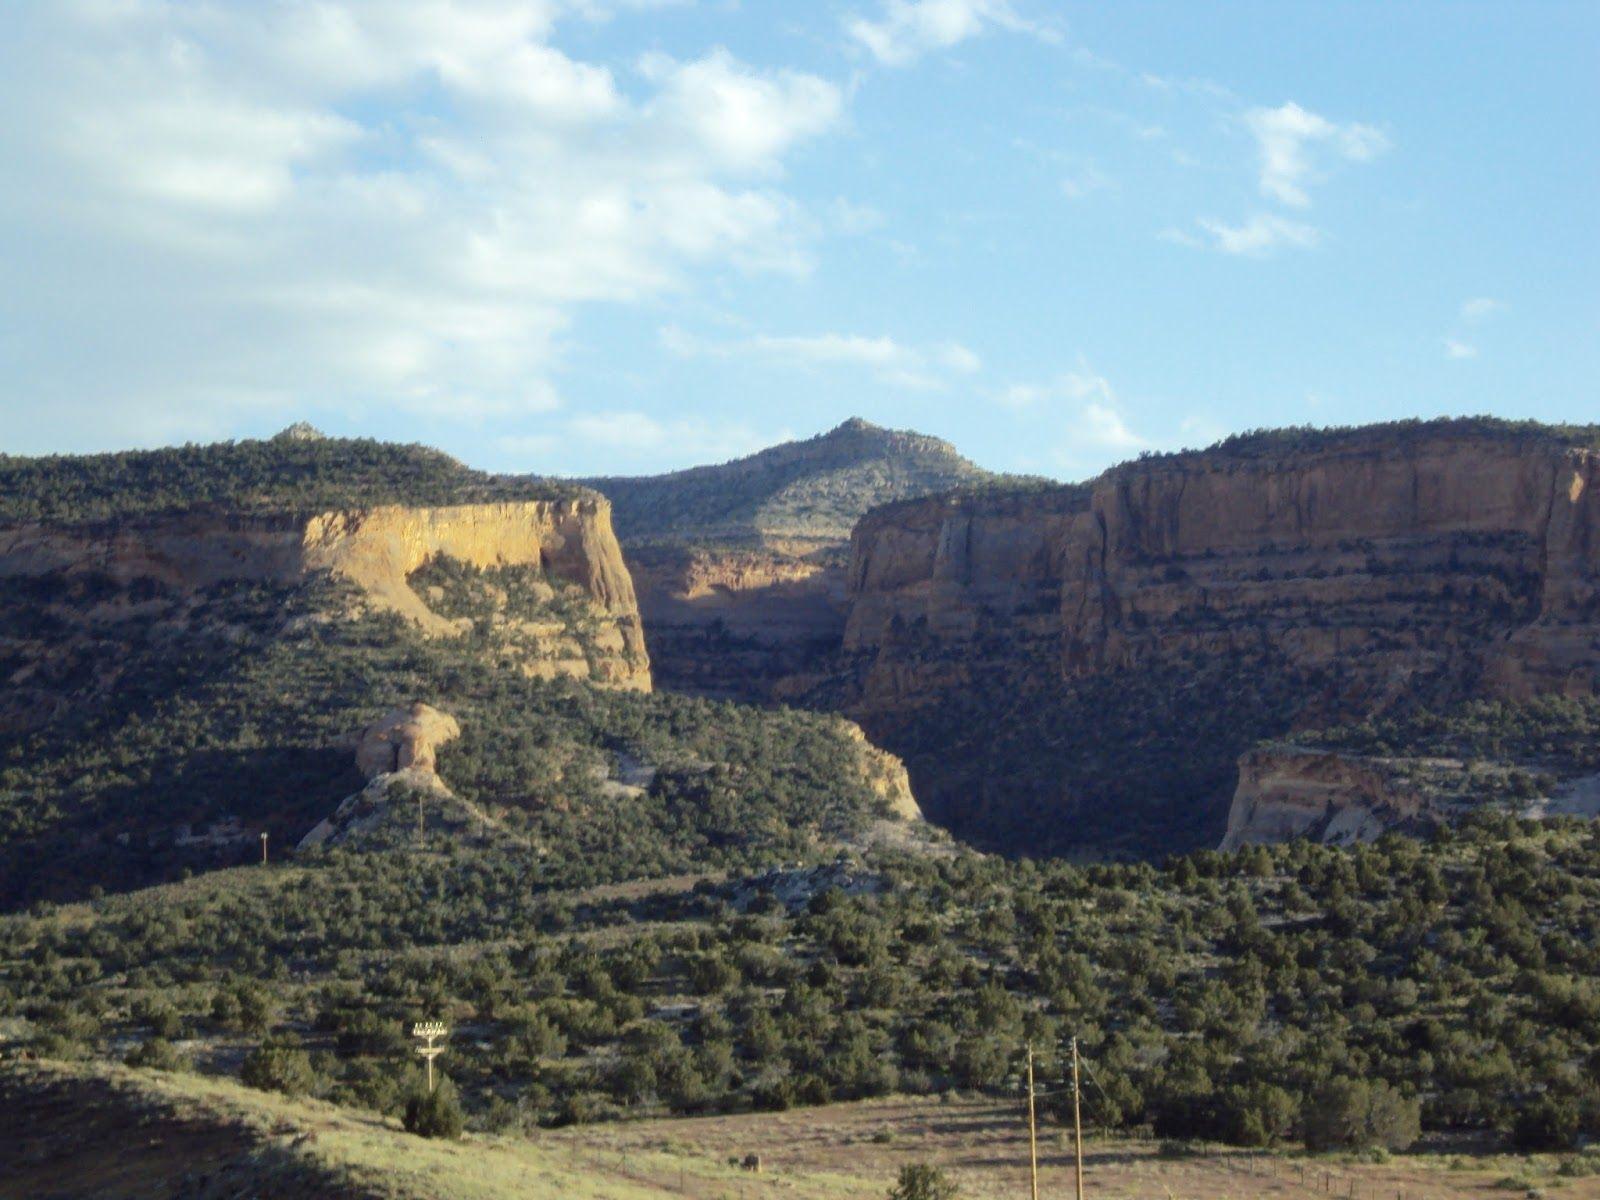 Amy's Creative Pursuits: Dinosaur Hill, Fruita, Colorado